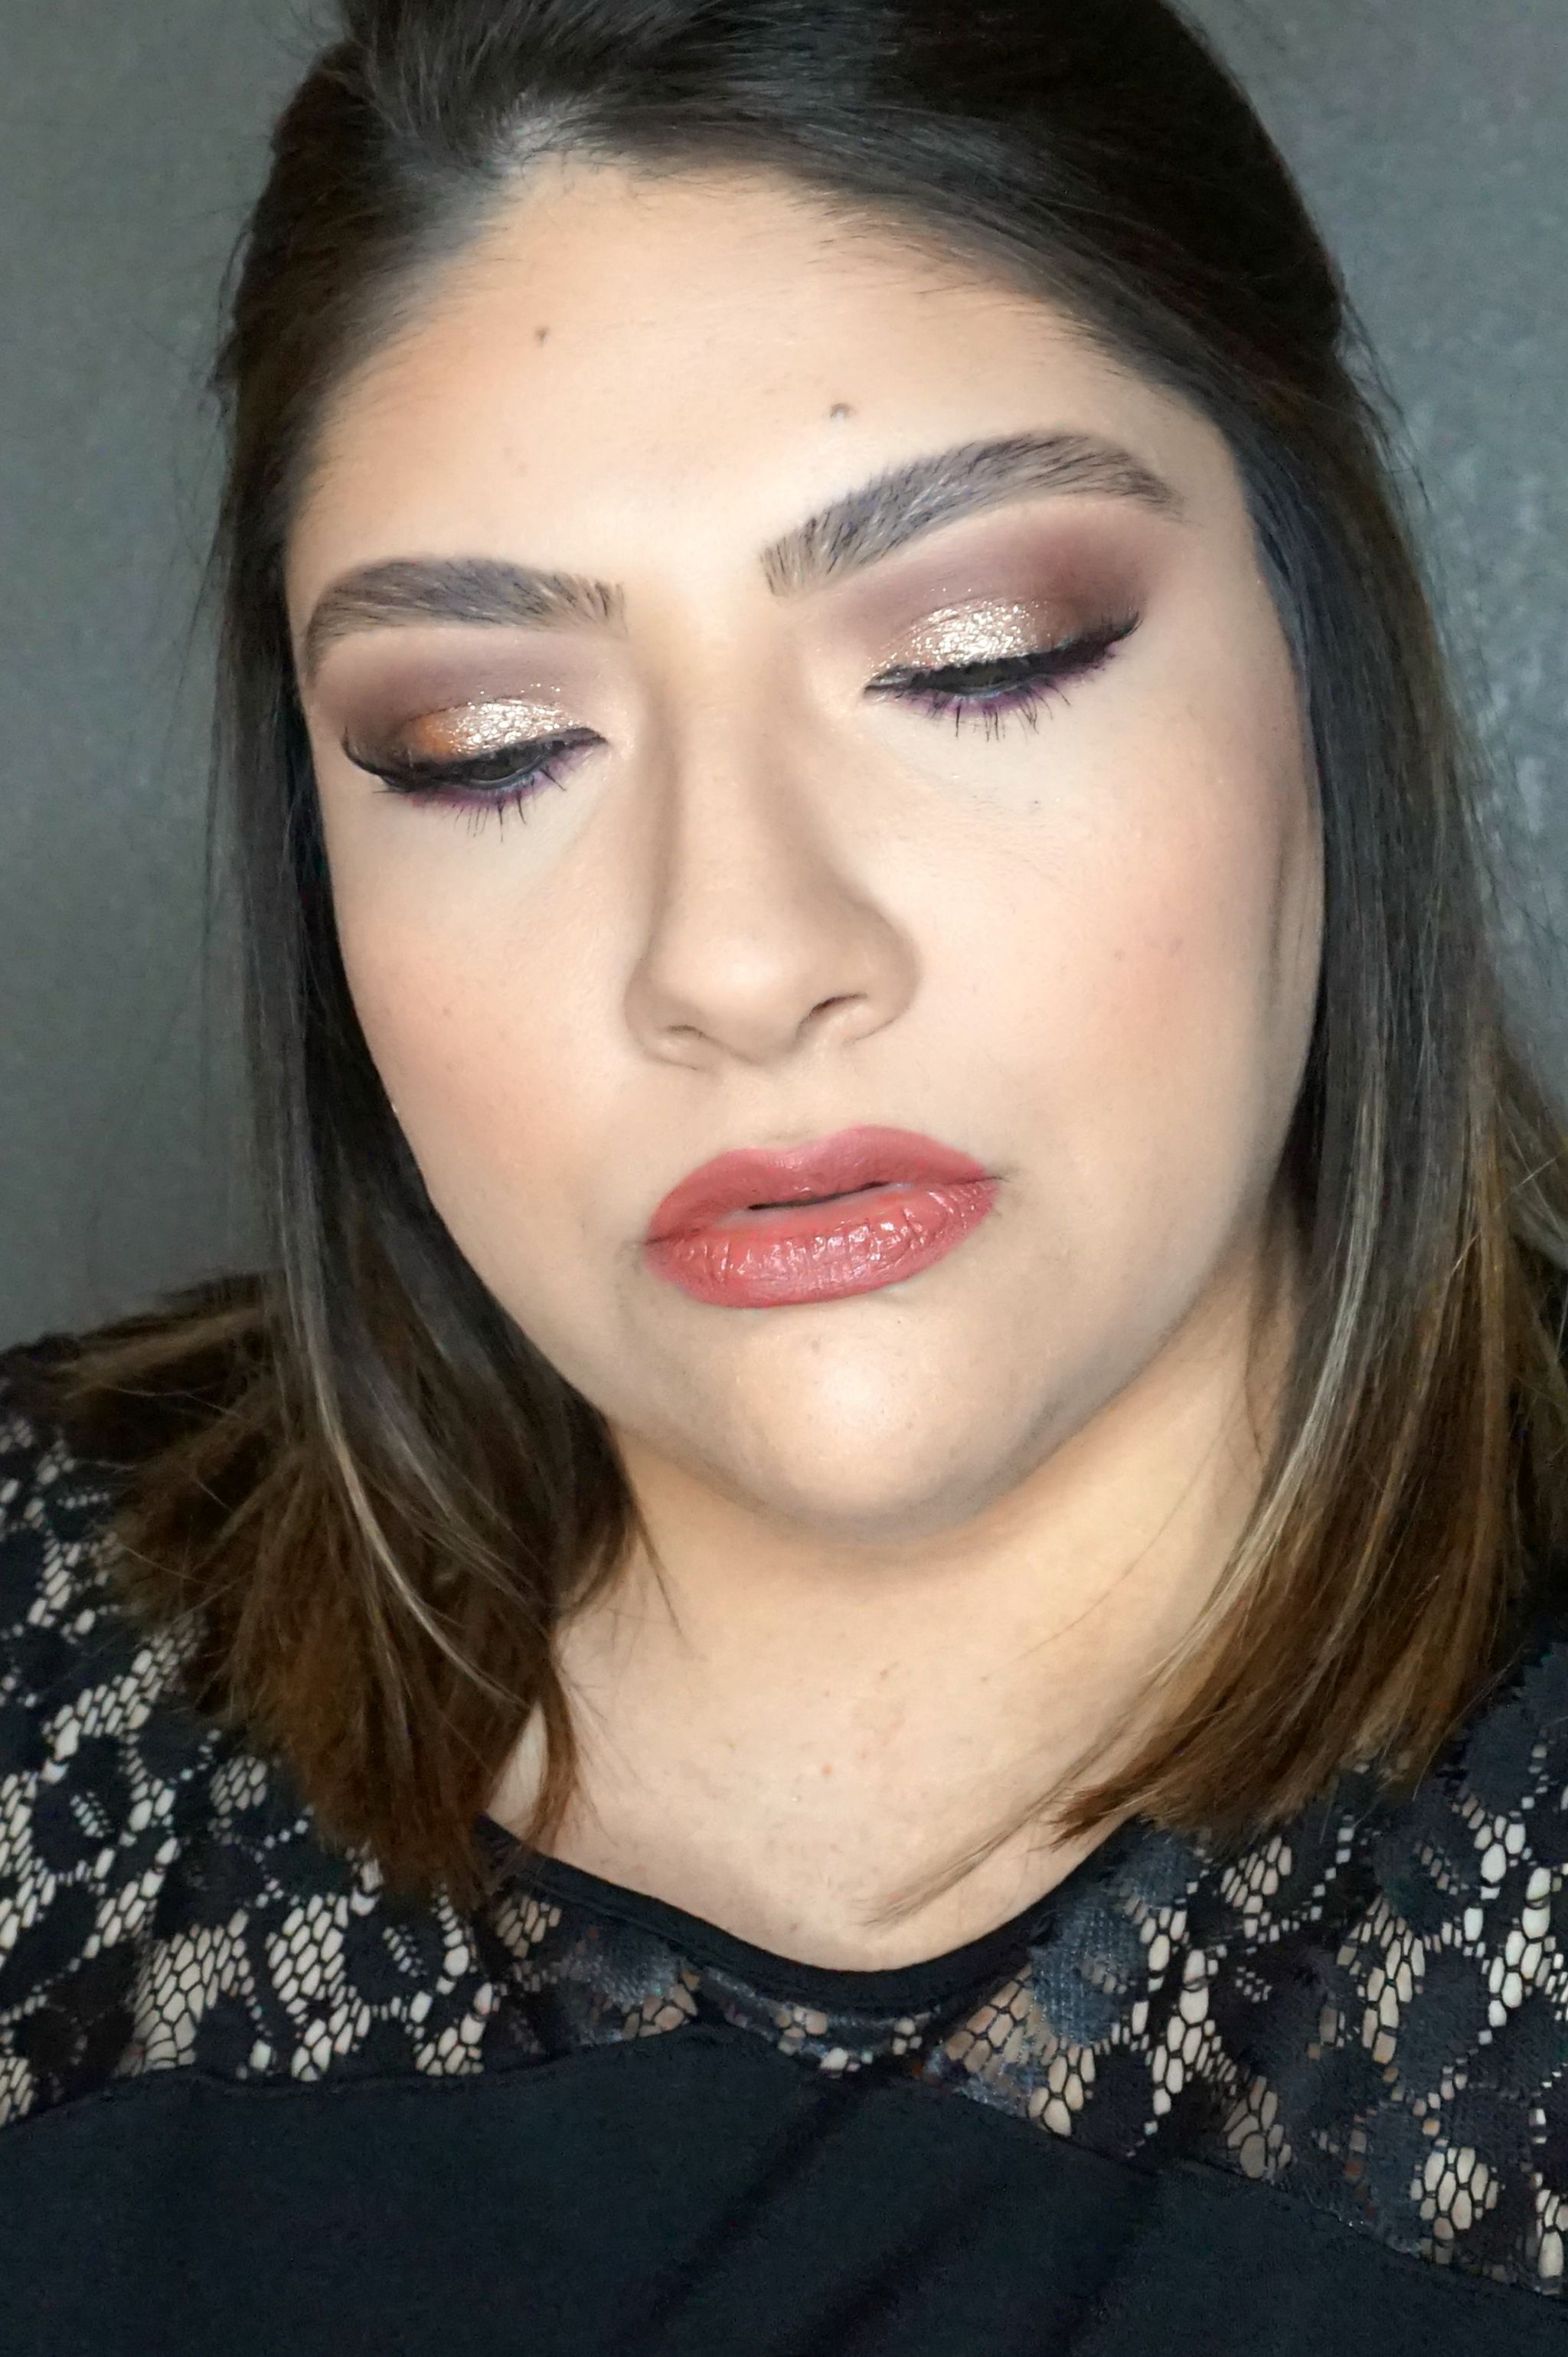 Metallic Eye Look / Glitter Eye Look | Beauty With Lily #beautyblogger #glittereyelook